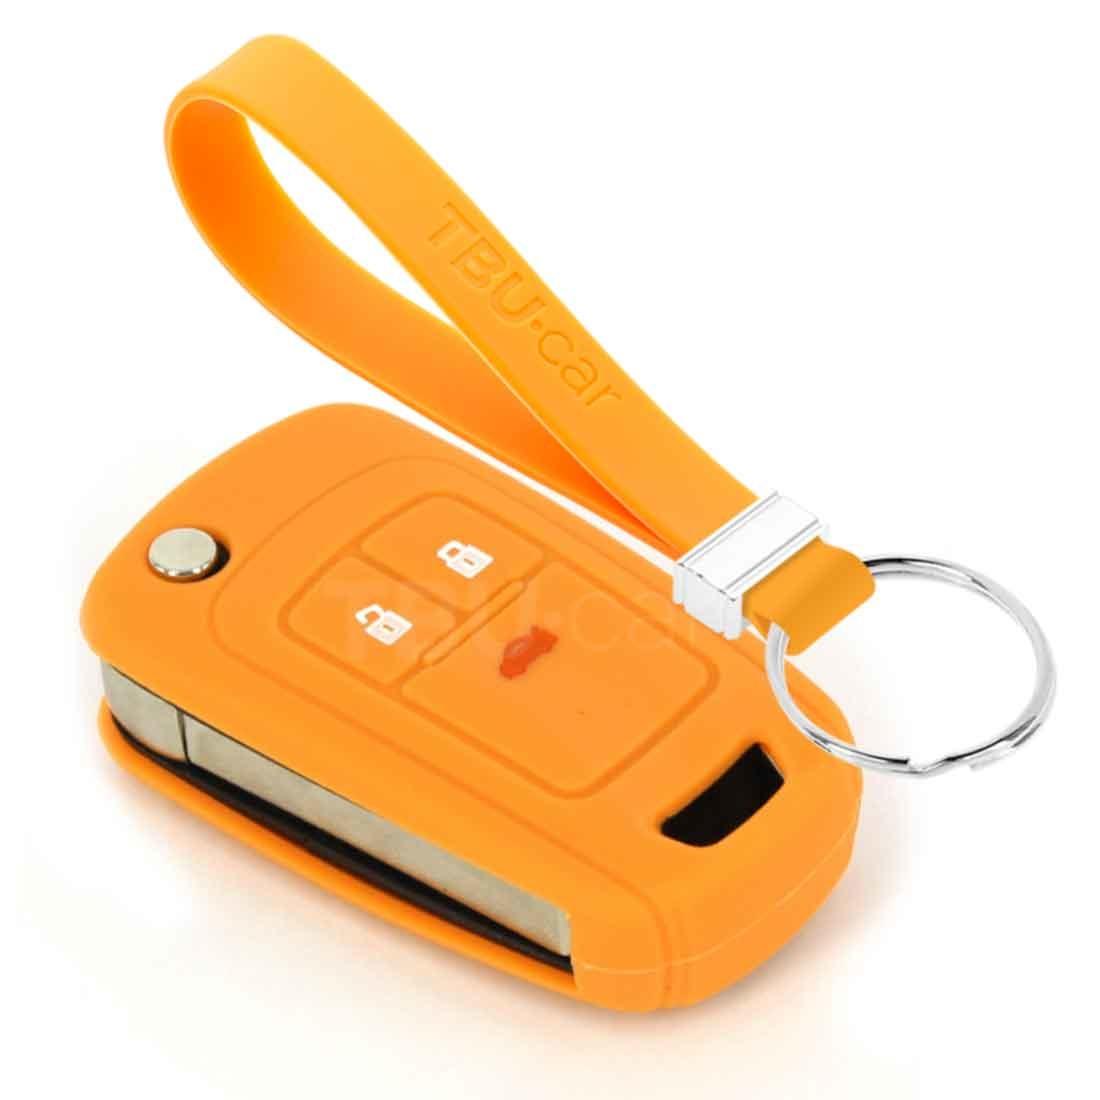 TBU car TBU car Car key cover compatible with Chevrolet - Silicone Protective Remote Key Shell - FOB Case Cover - Orange